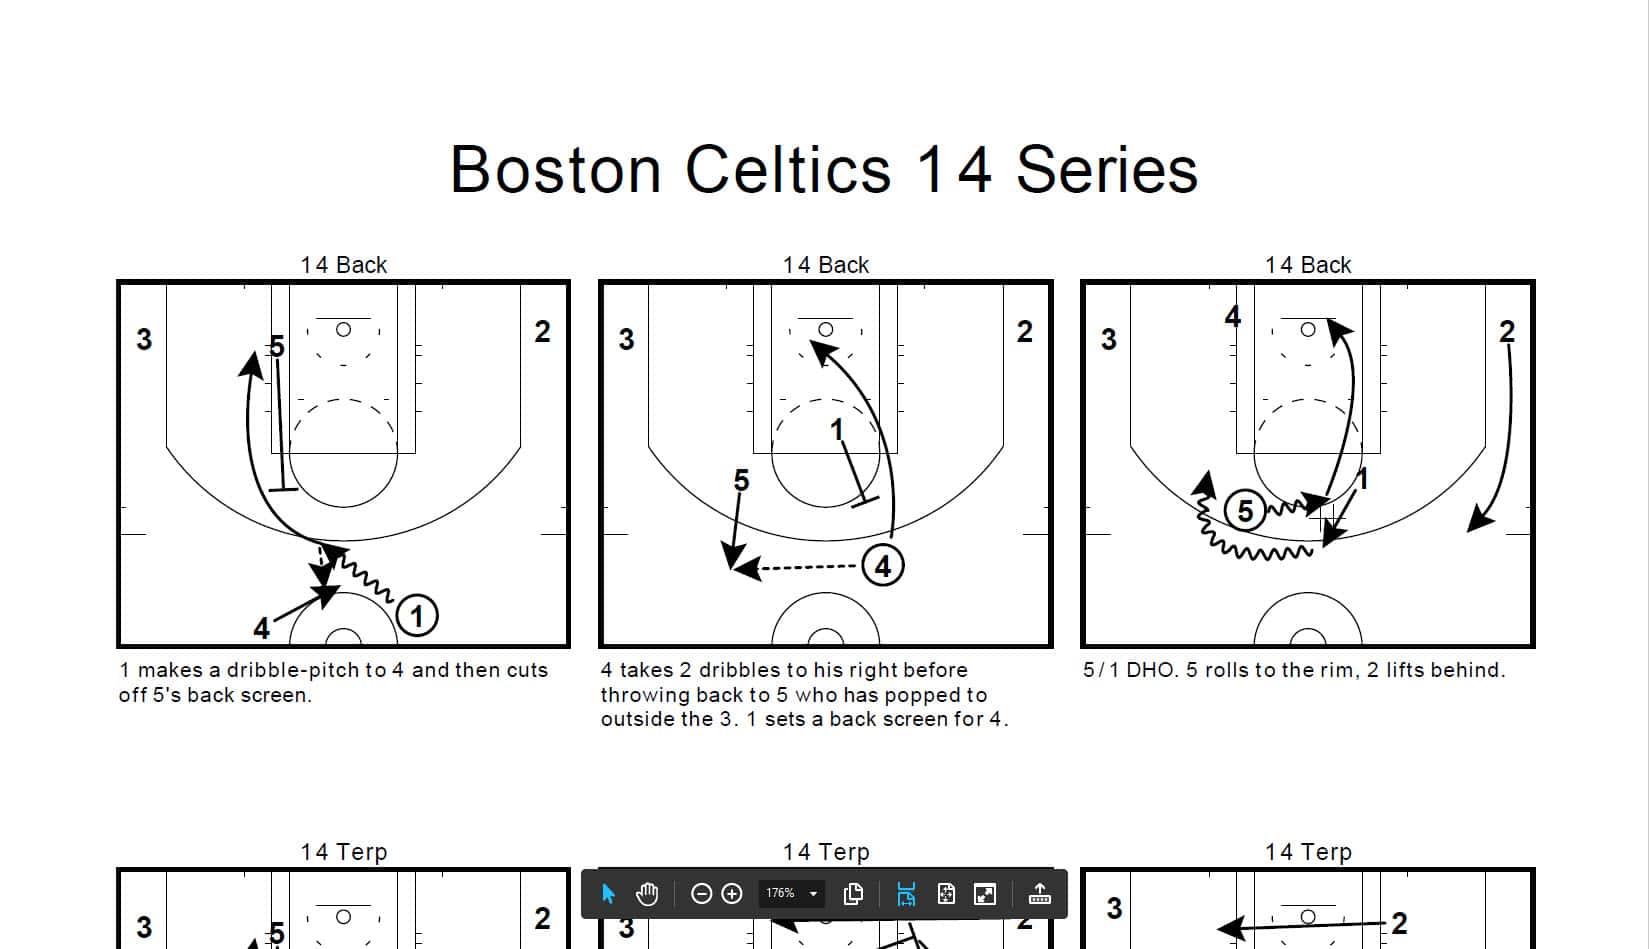 Brad Stevens NBA Boston Celtics